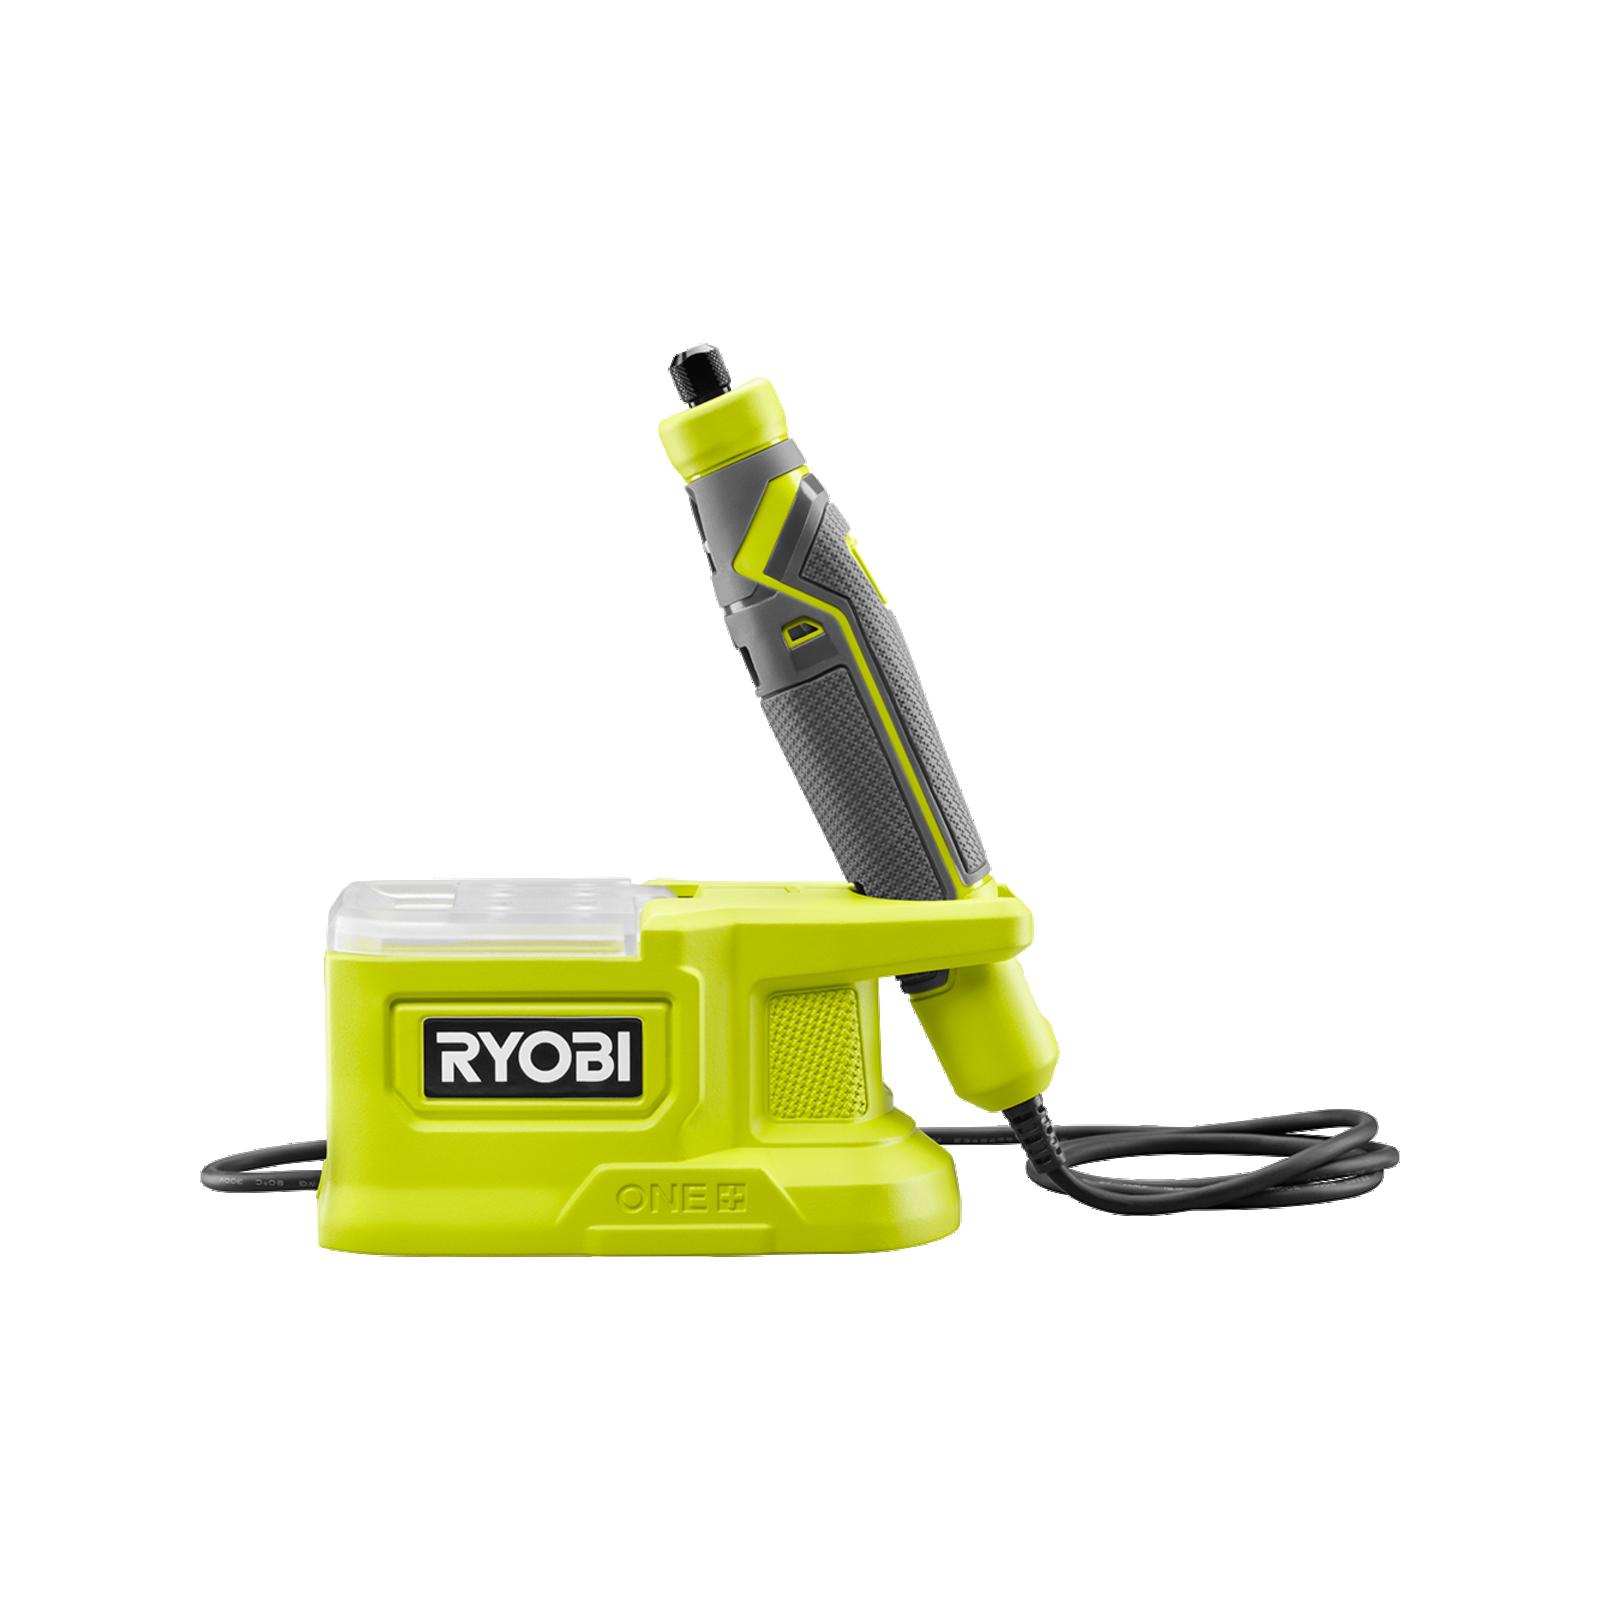 Ryobi 18V ONE+ Precision Rotary Tool - Tool Only